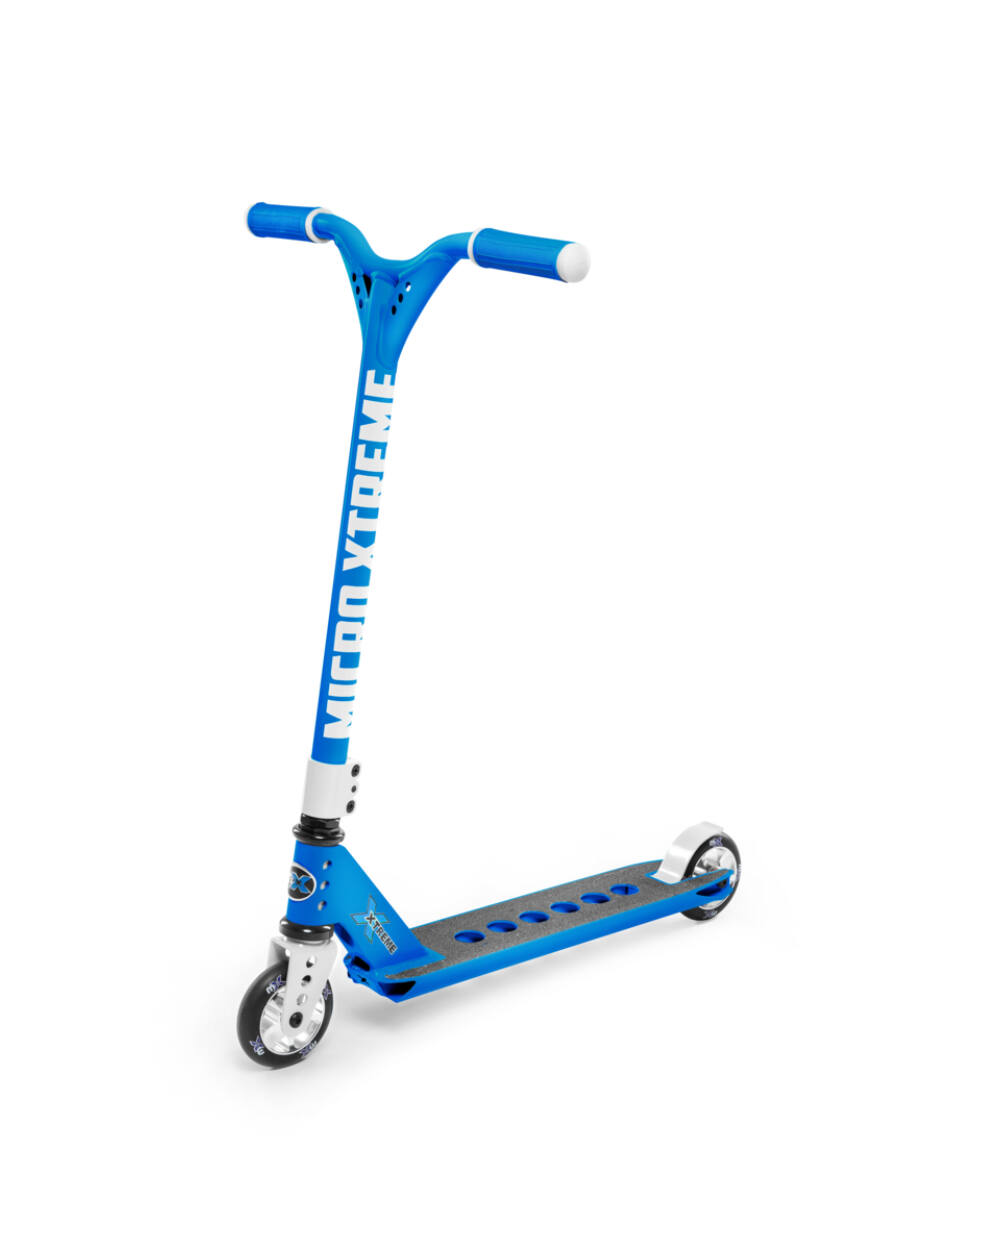 Micro mX trixx 2.0 Ocean Blue extrém roller